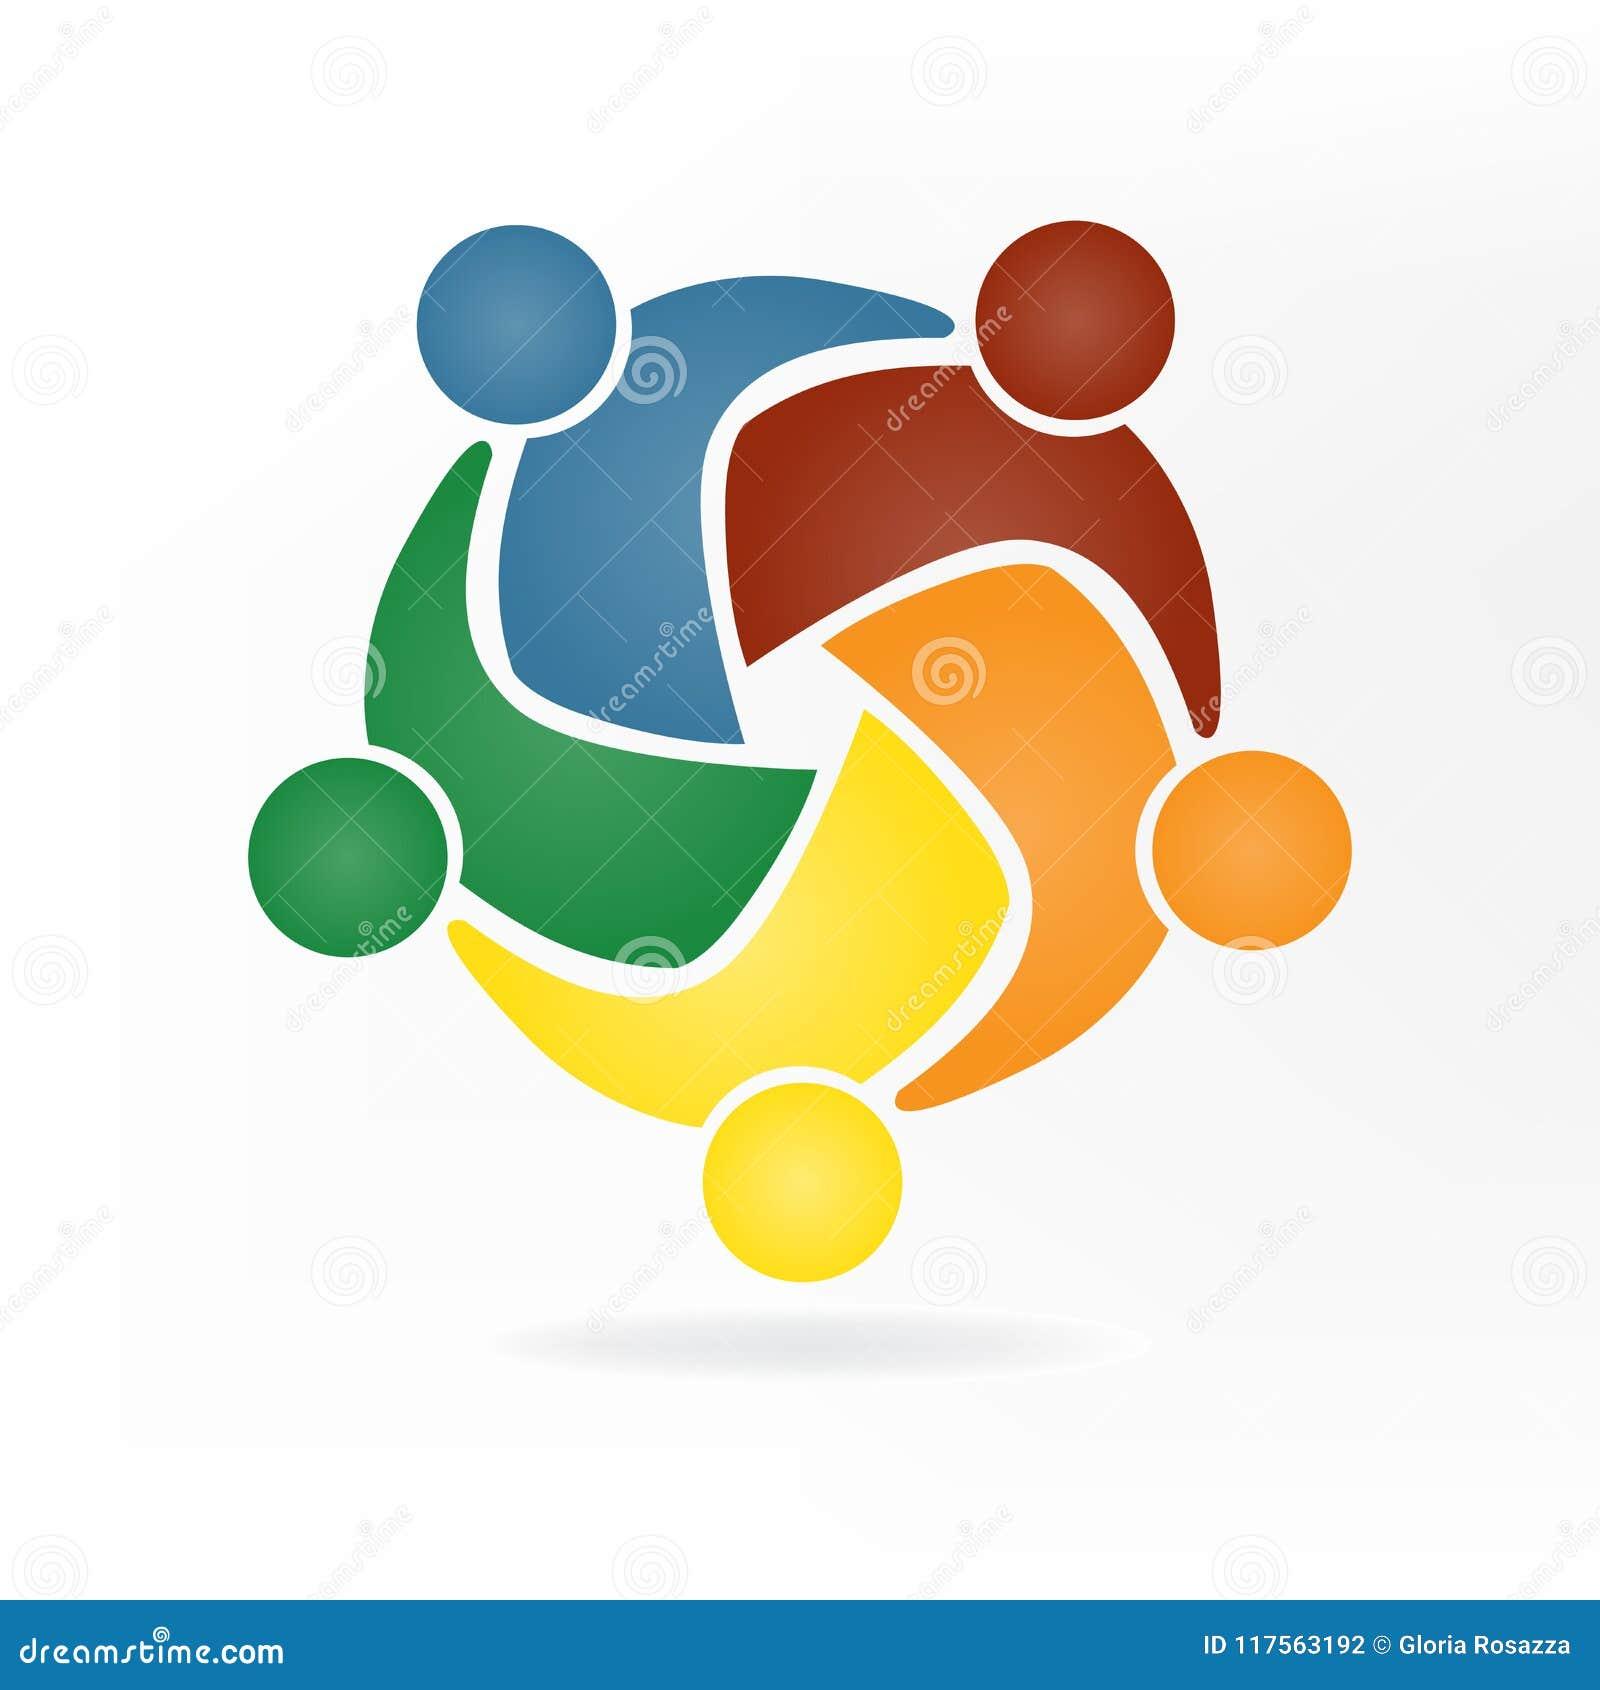 Teamwork business logo. Concept of community union goals solidarity